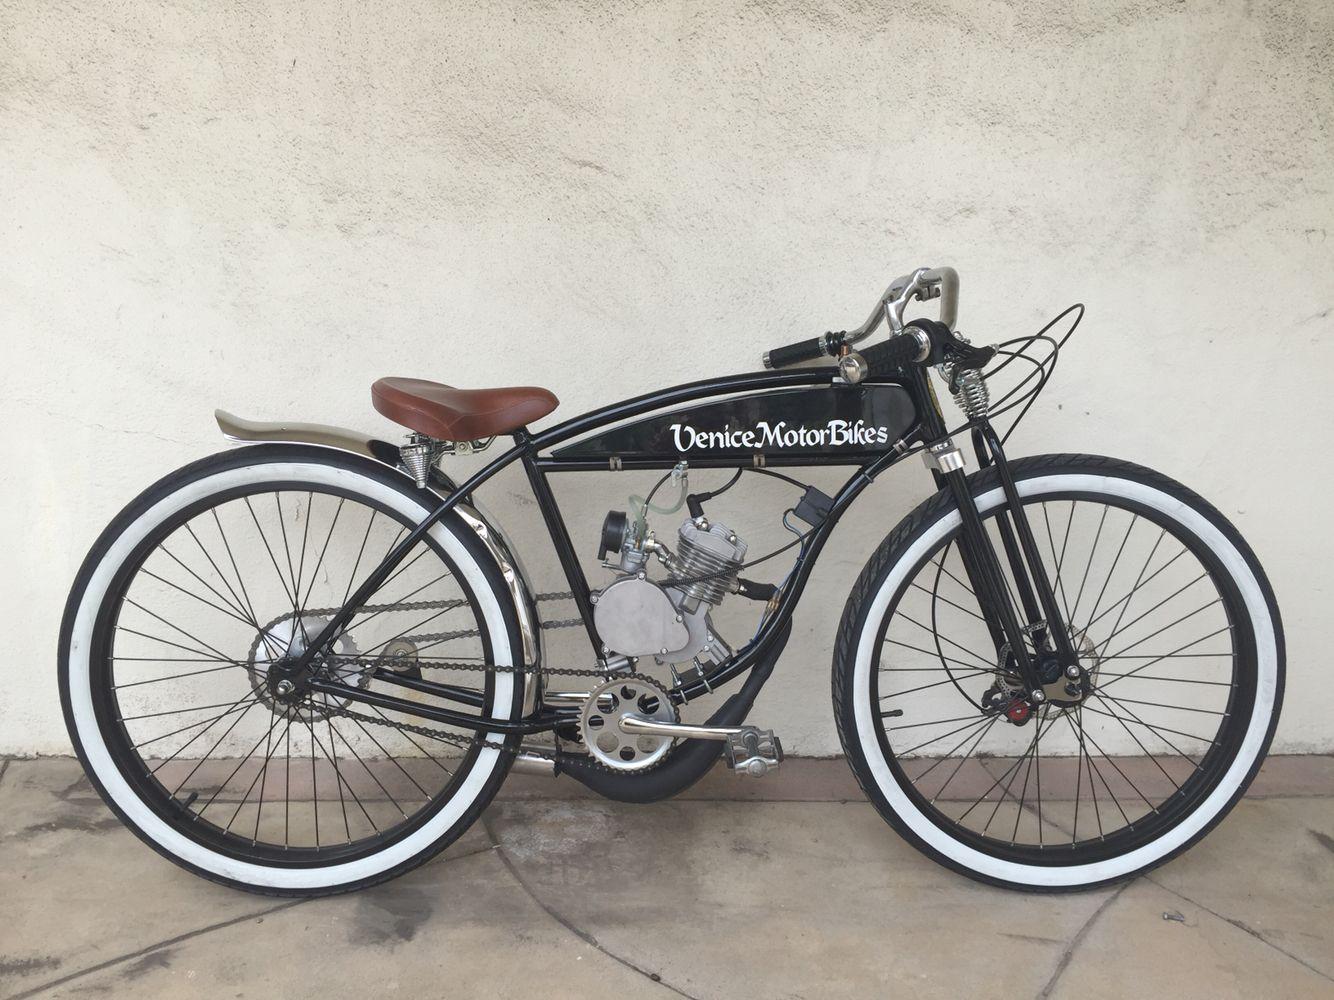 Vintage schwinn btr board track racer vintage motorcycle replica motorized bicycle piston bike